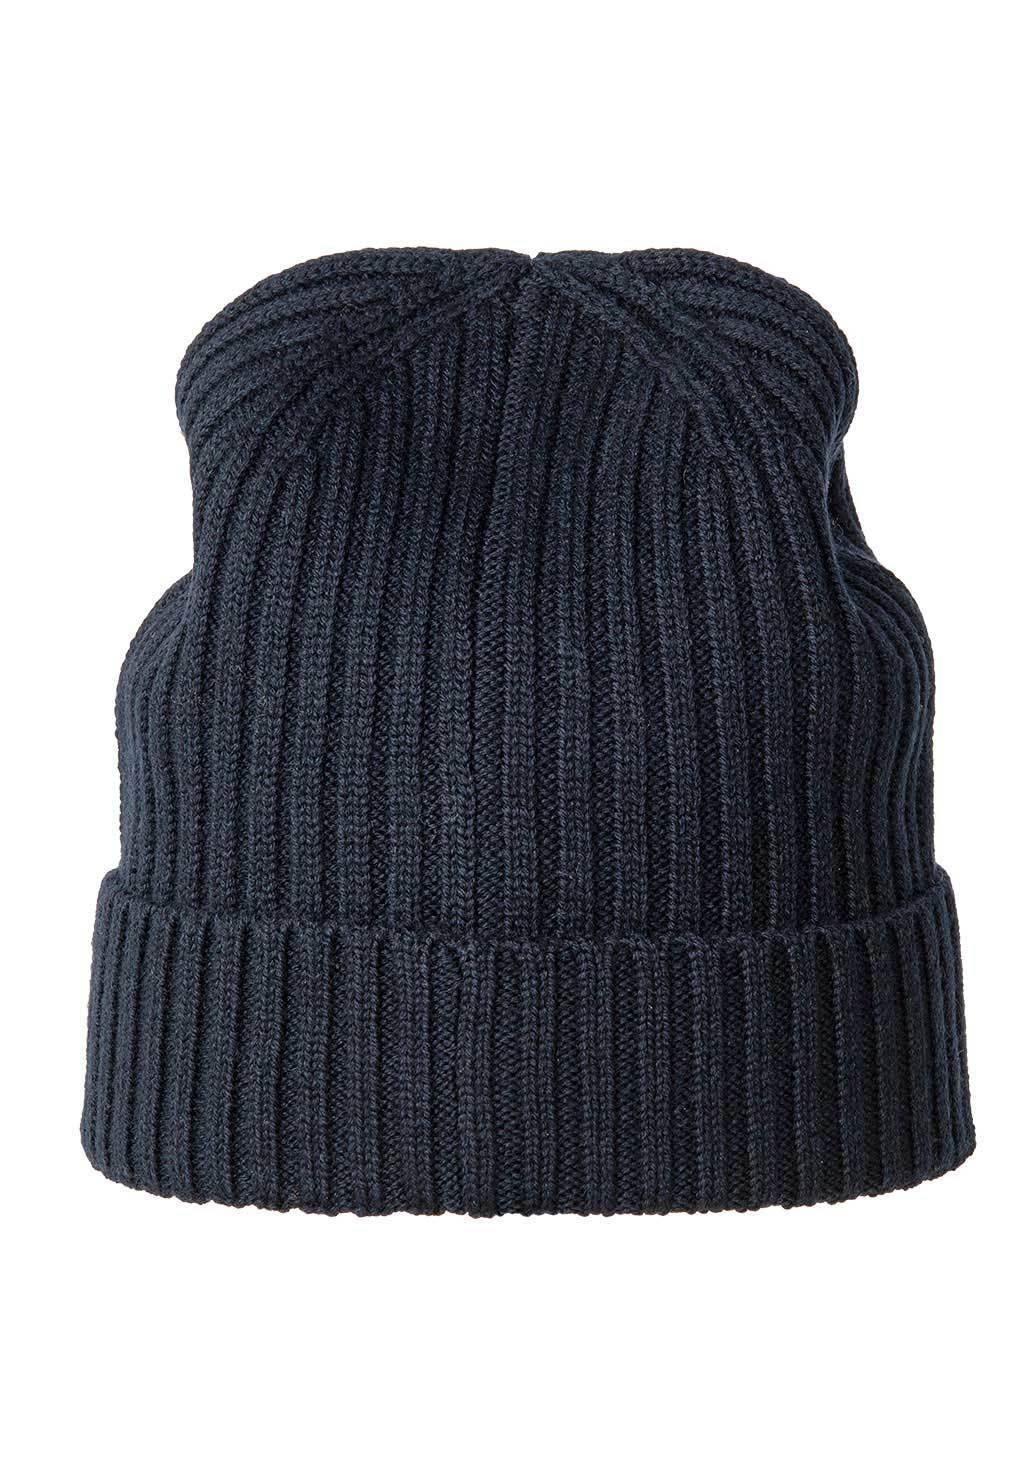 Joop! Francis - Mütze Blau